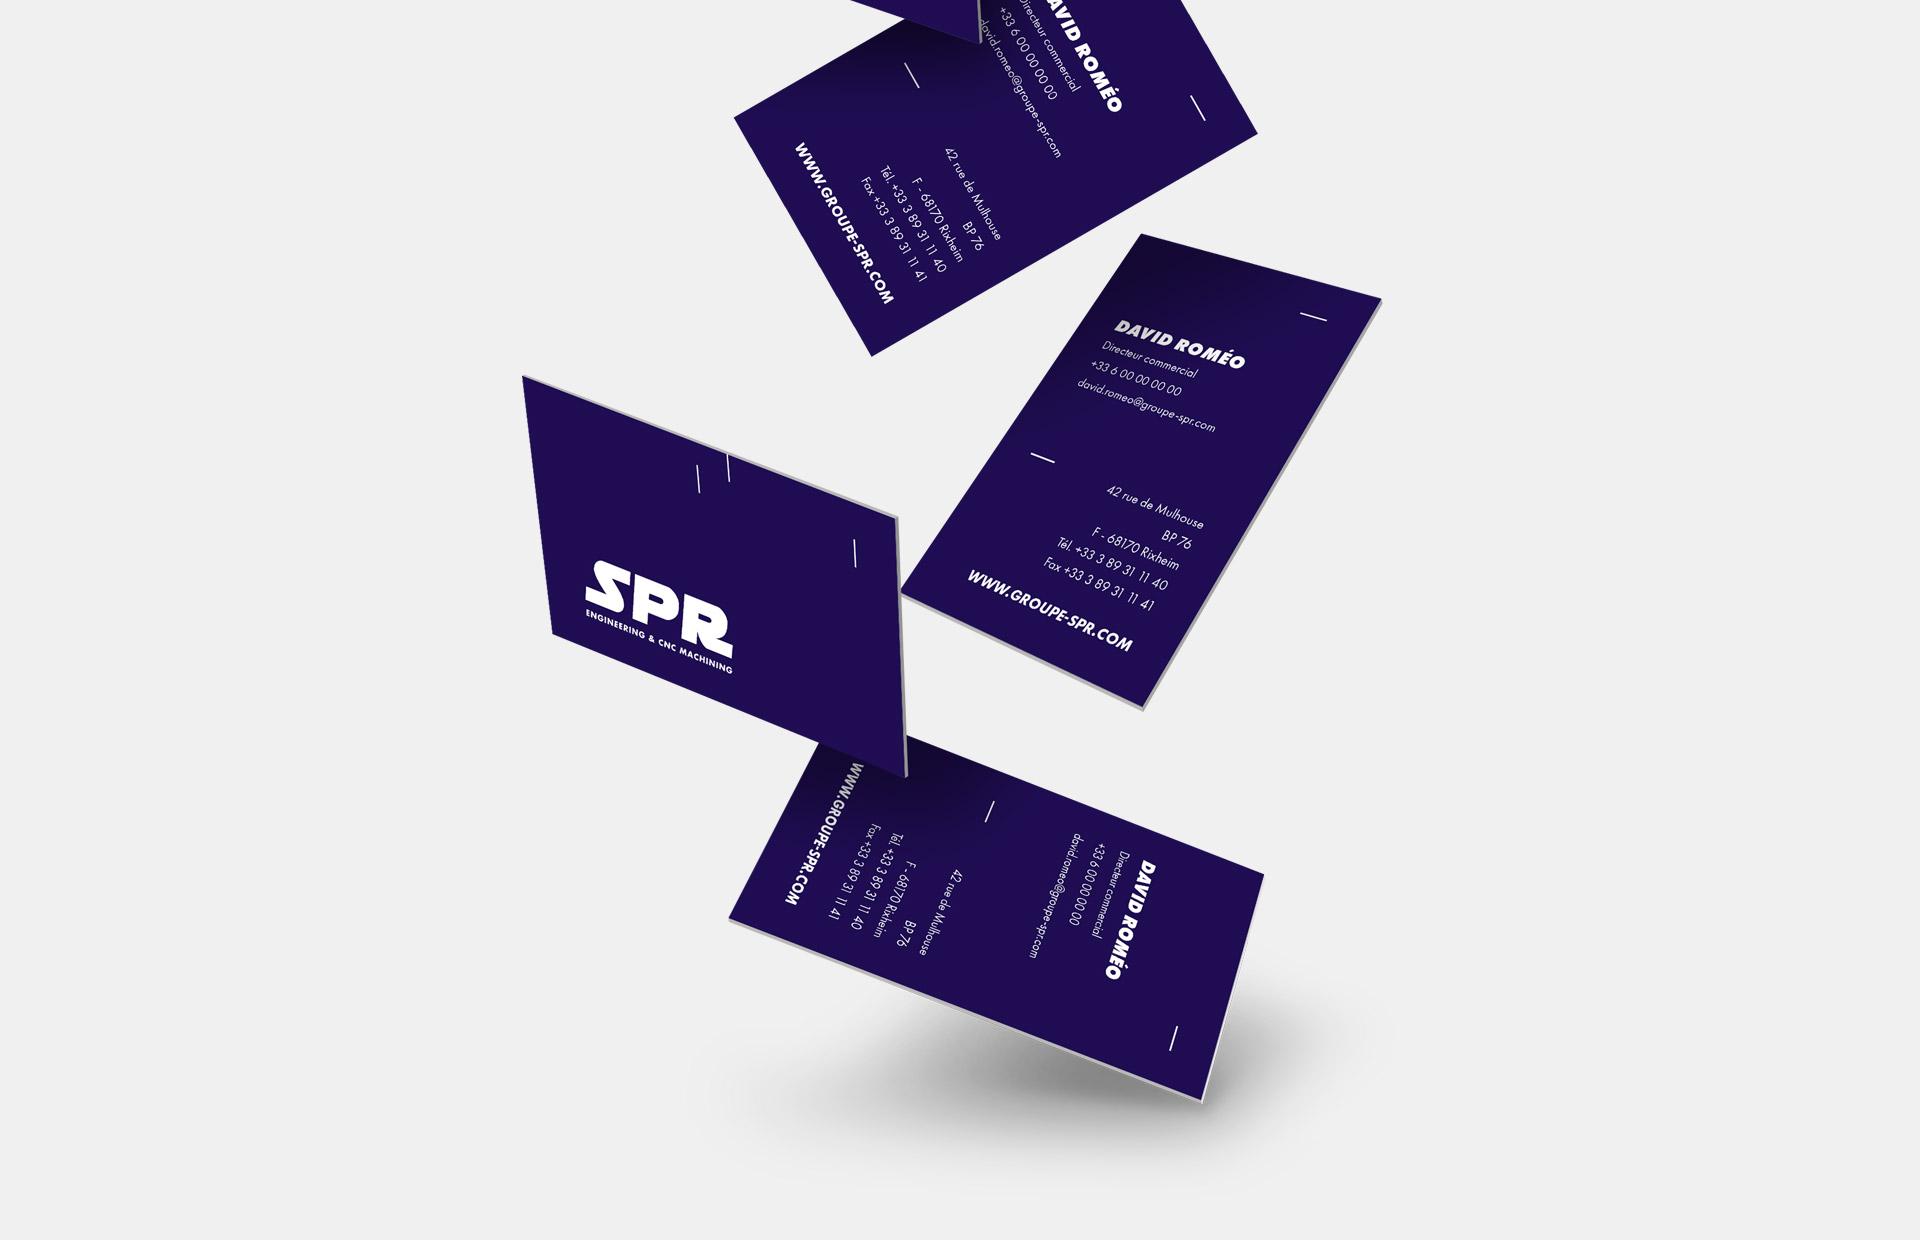 Groupe SPR